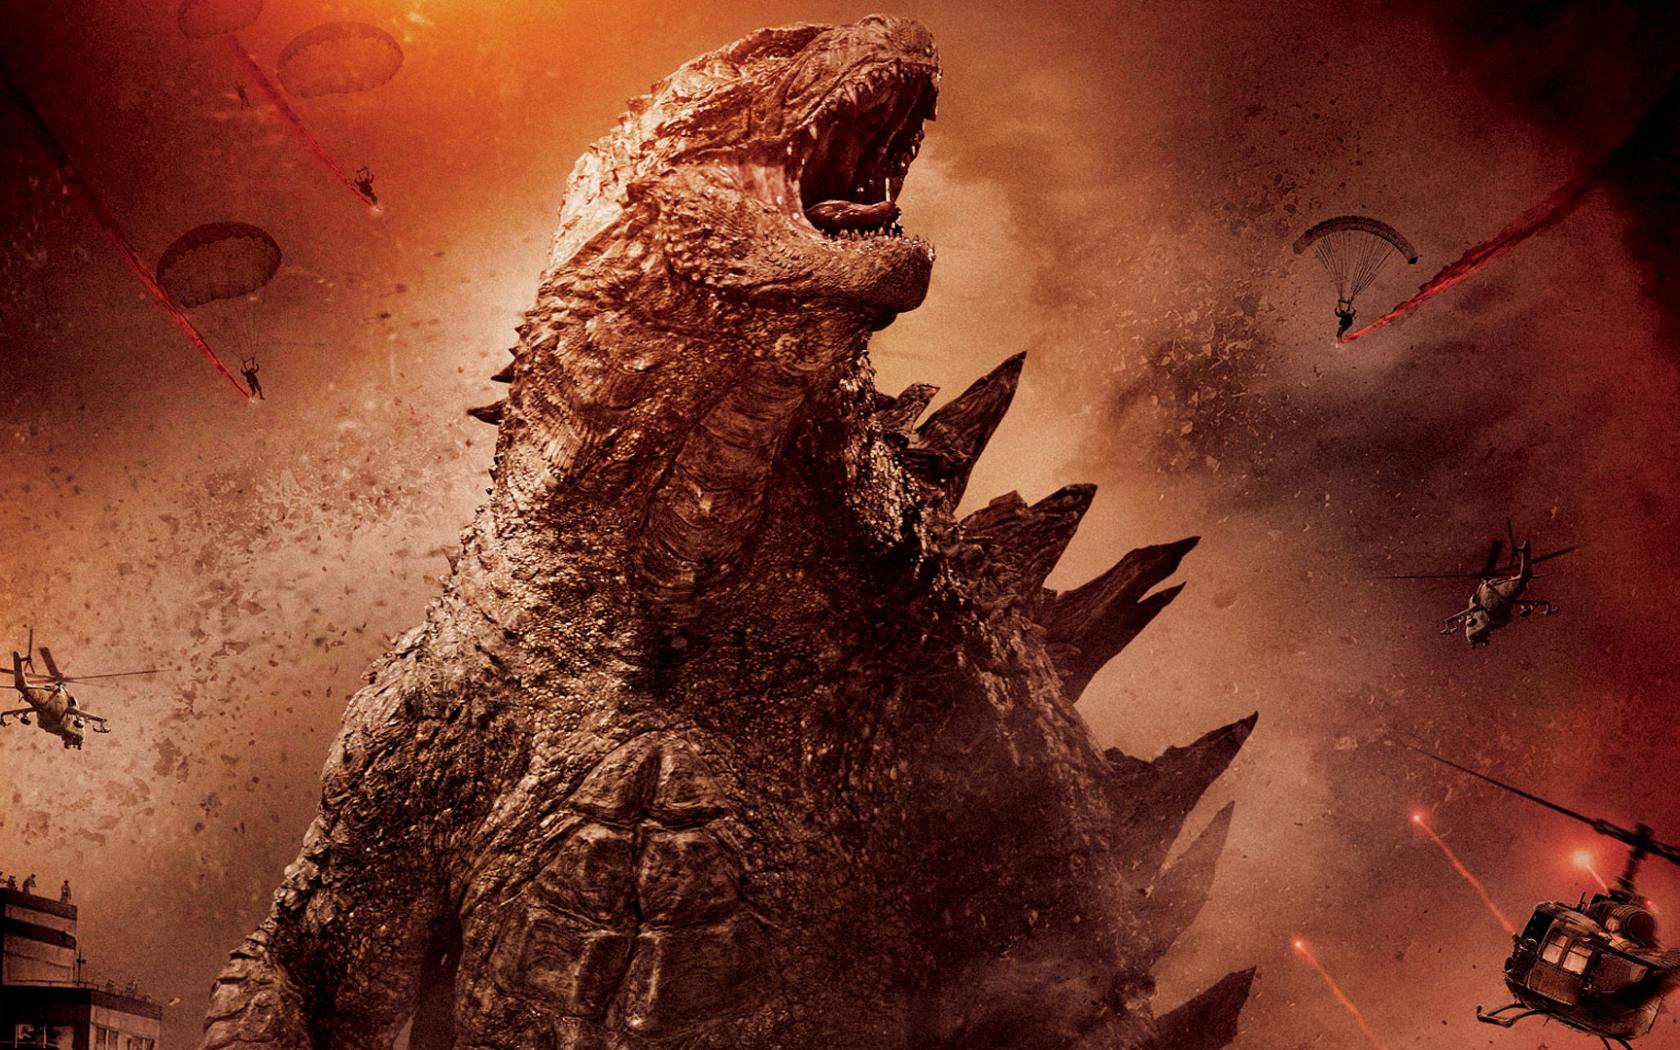 Free download download Godzilla Wallpaper Latest Hd Wallpapers ...